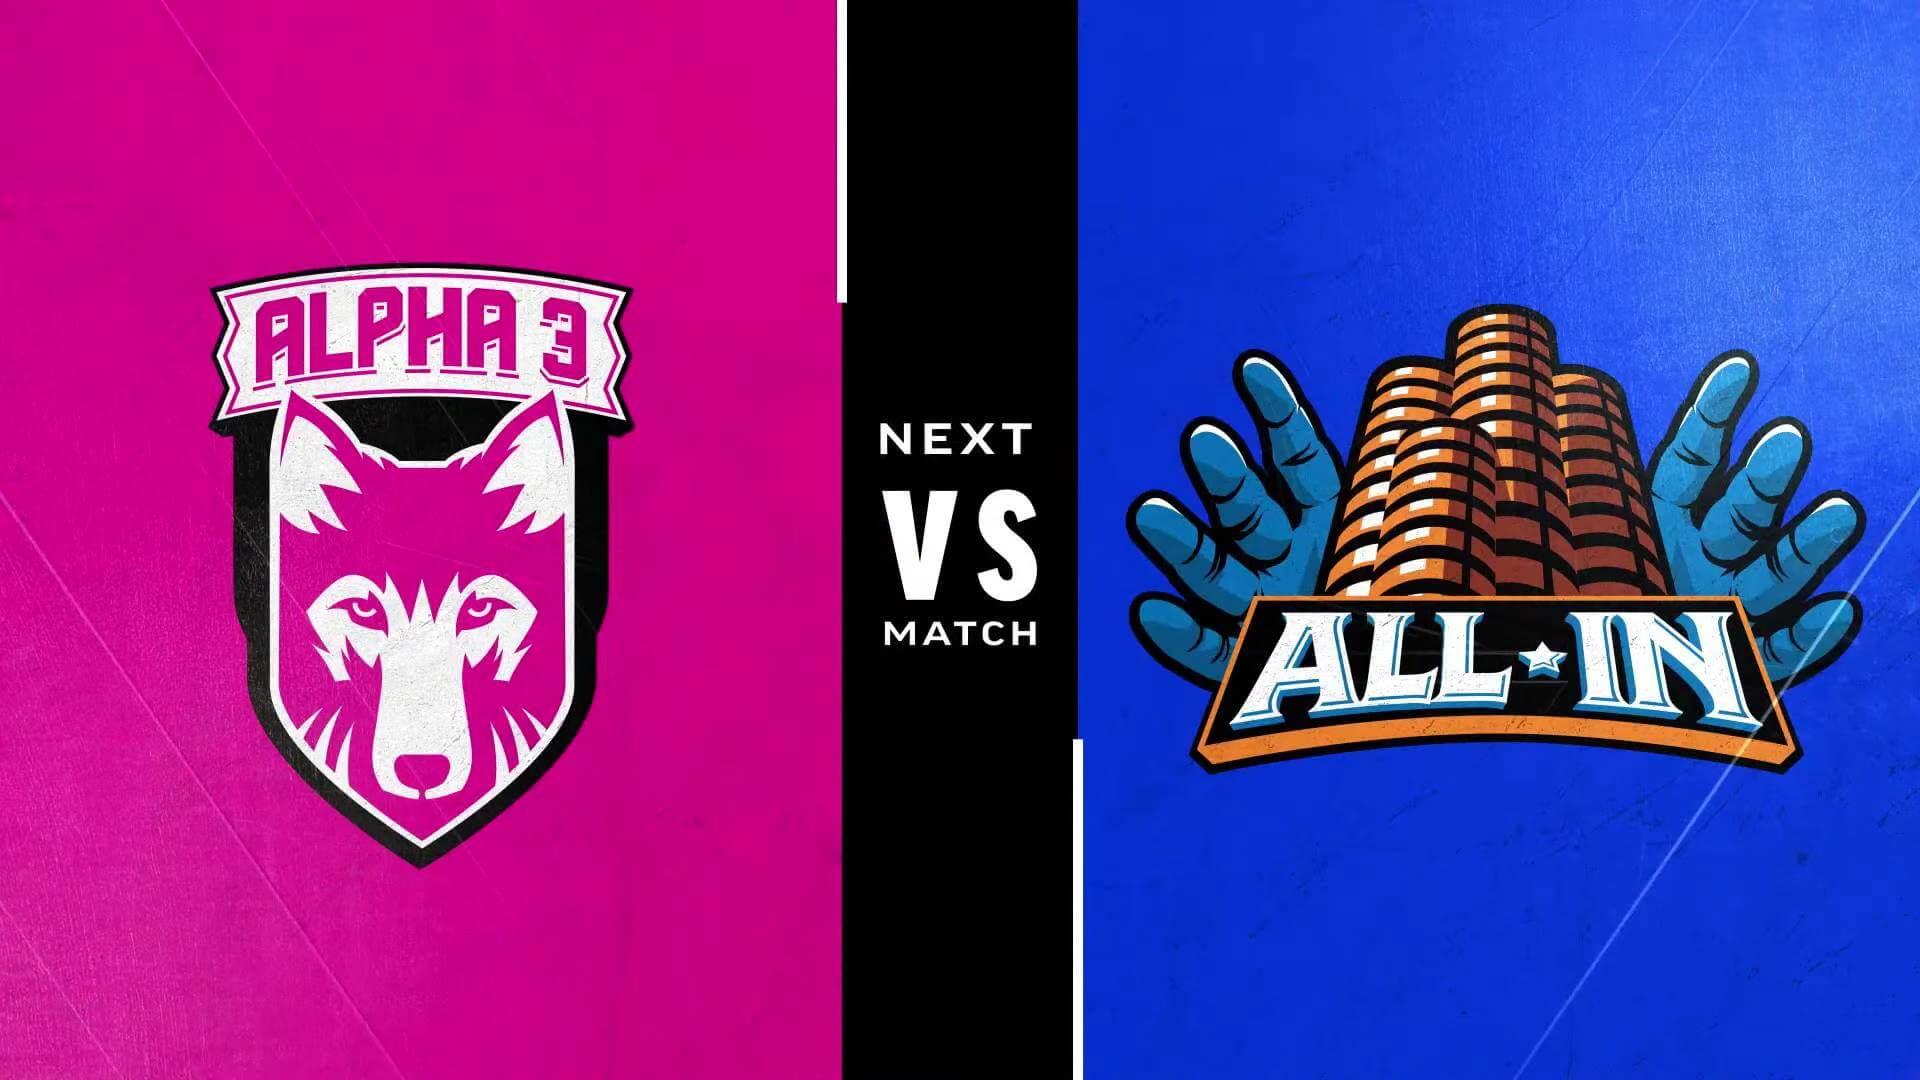 Street Fighter Leaguer Pro-US - Alpha 3 vs All-In team logos